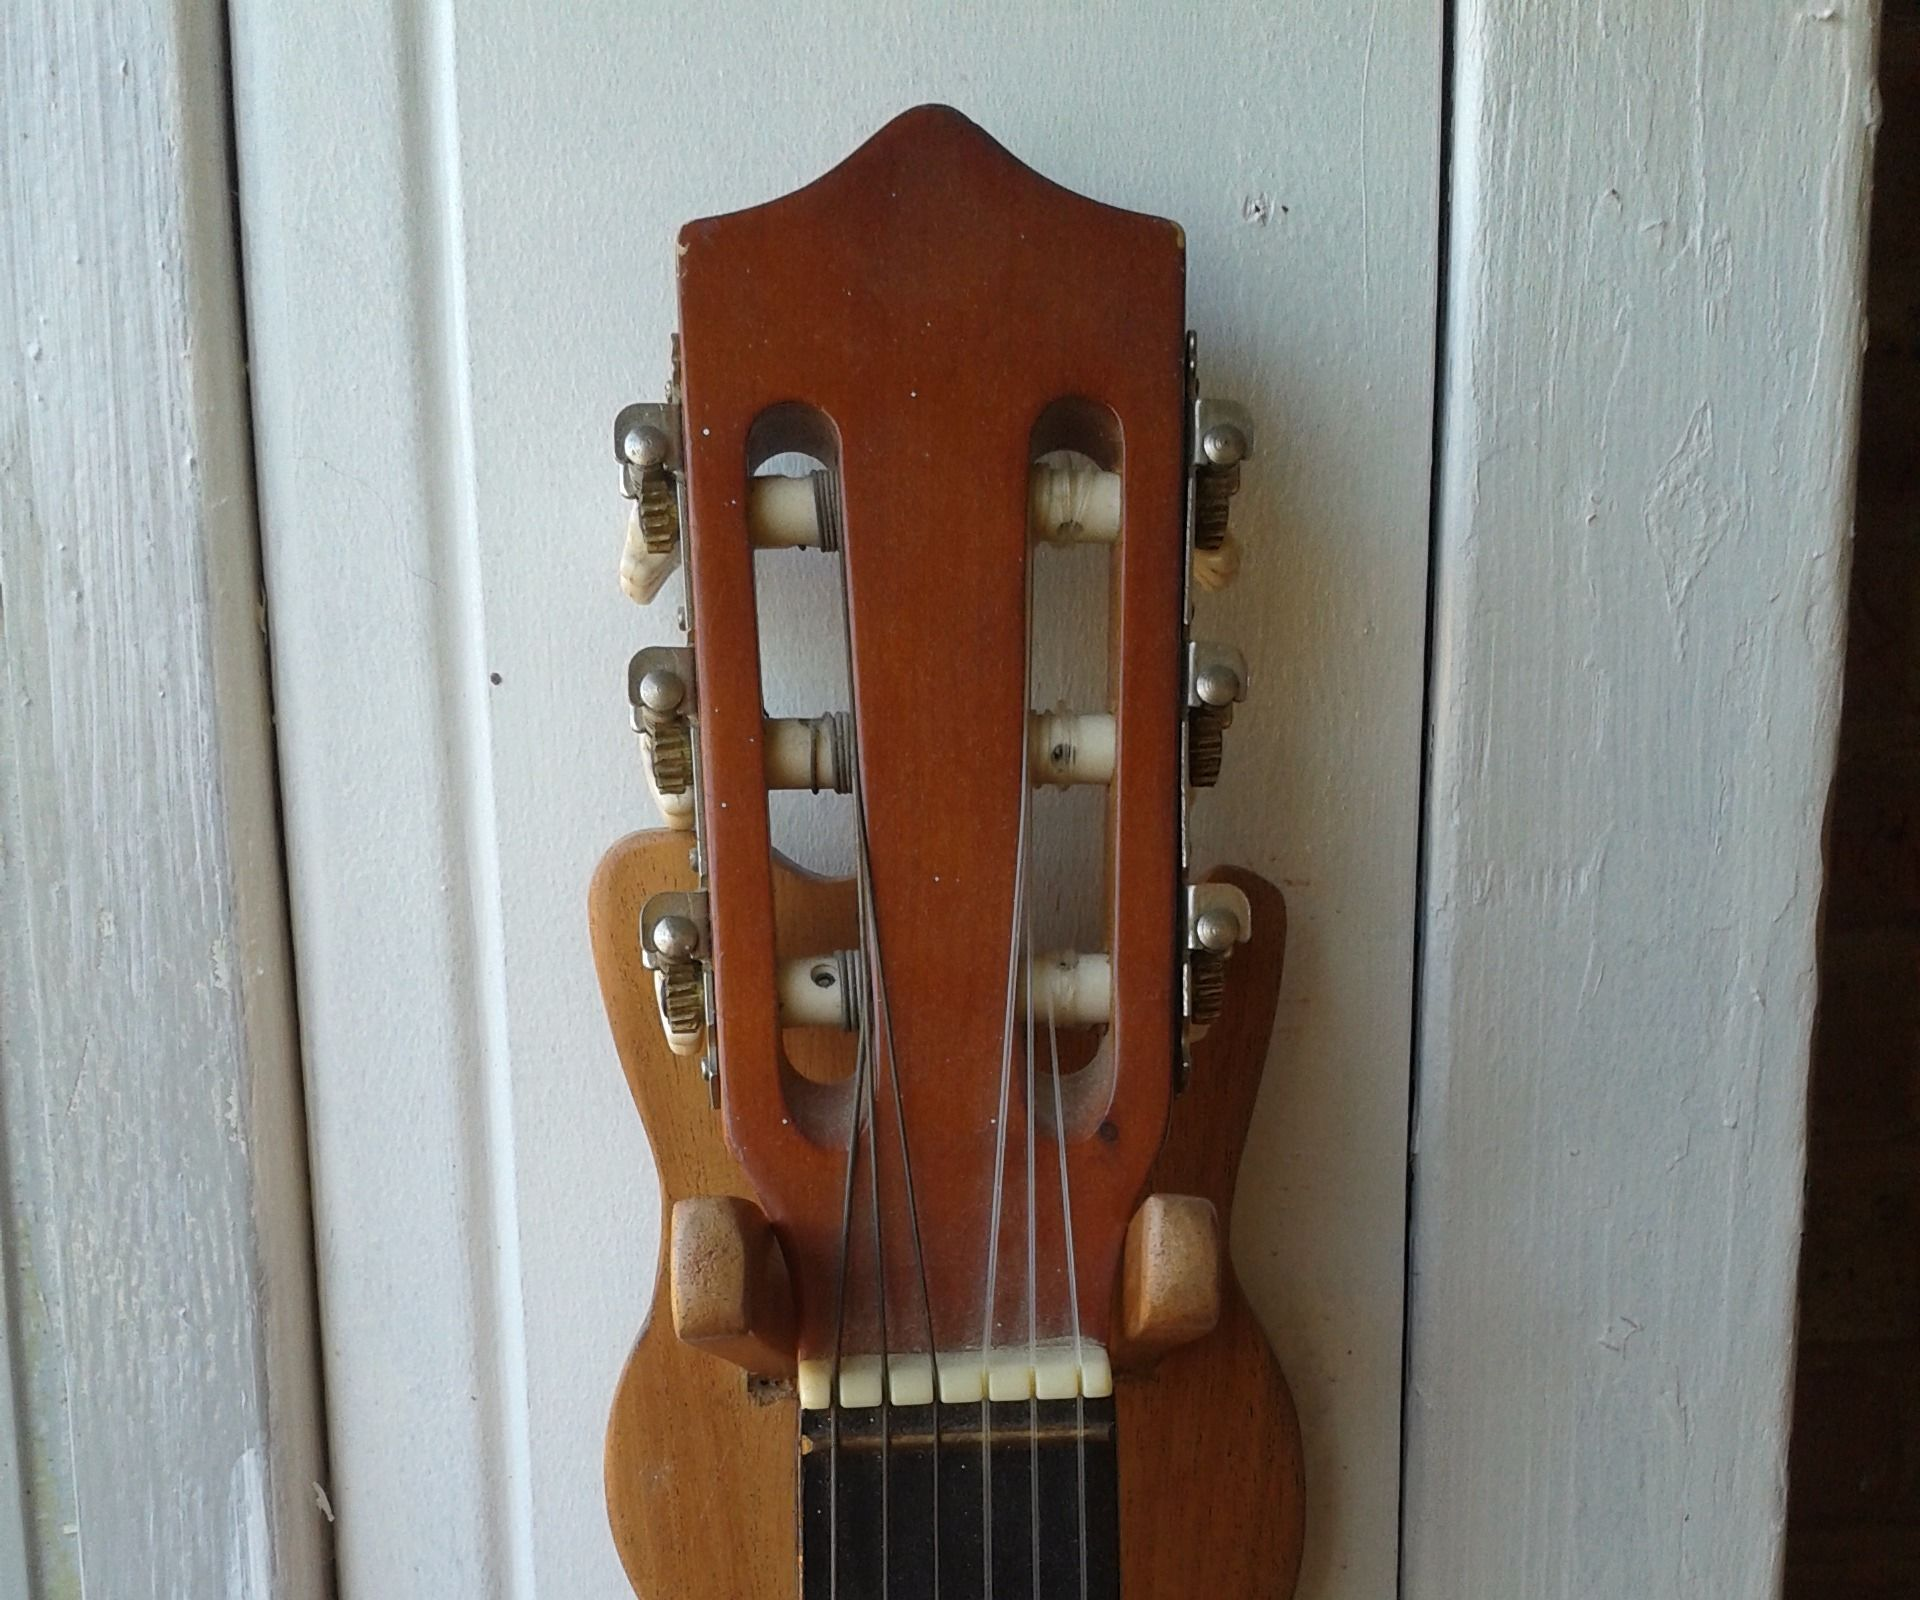 DIY - Guitar Wall Hanger - Wood Work